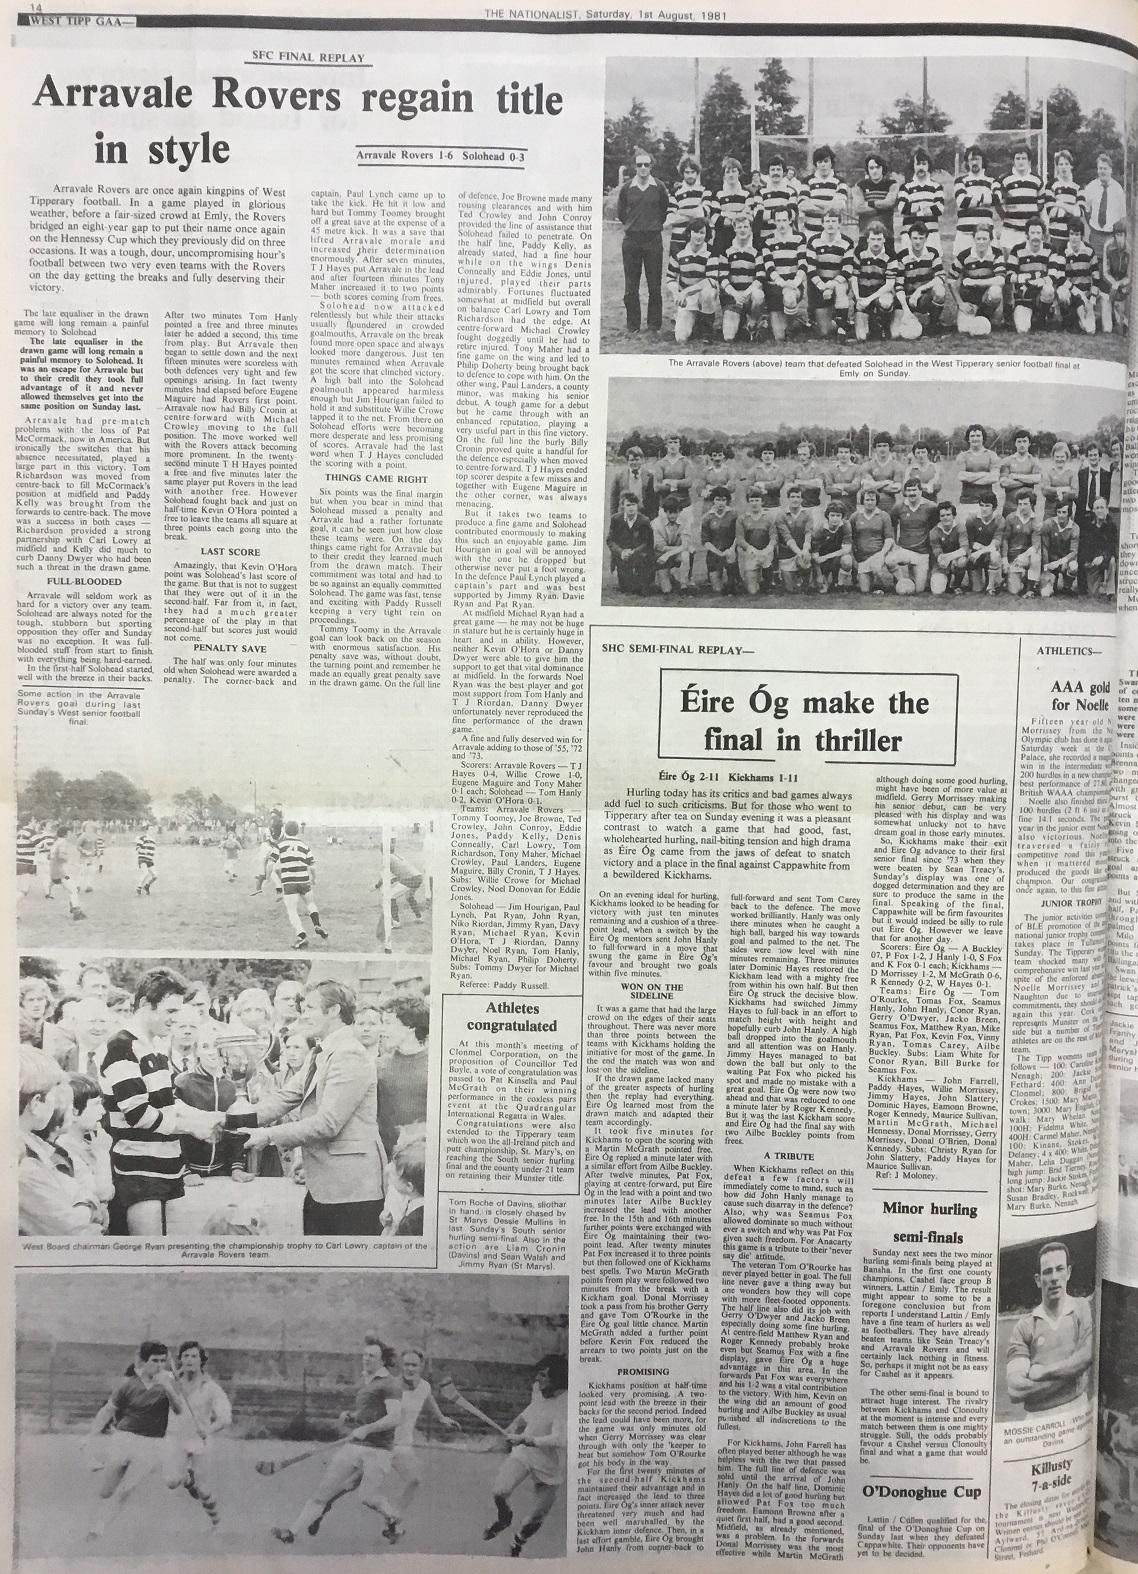 1981 West football final replay